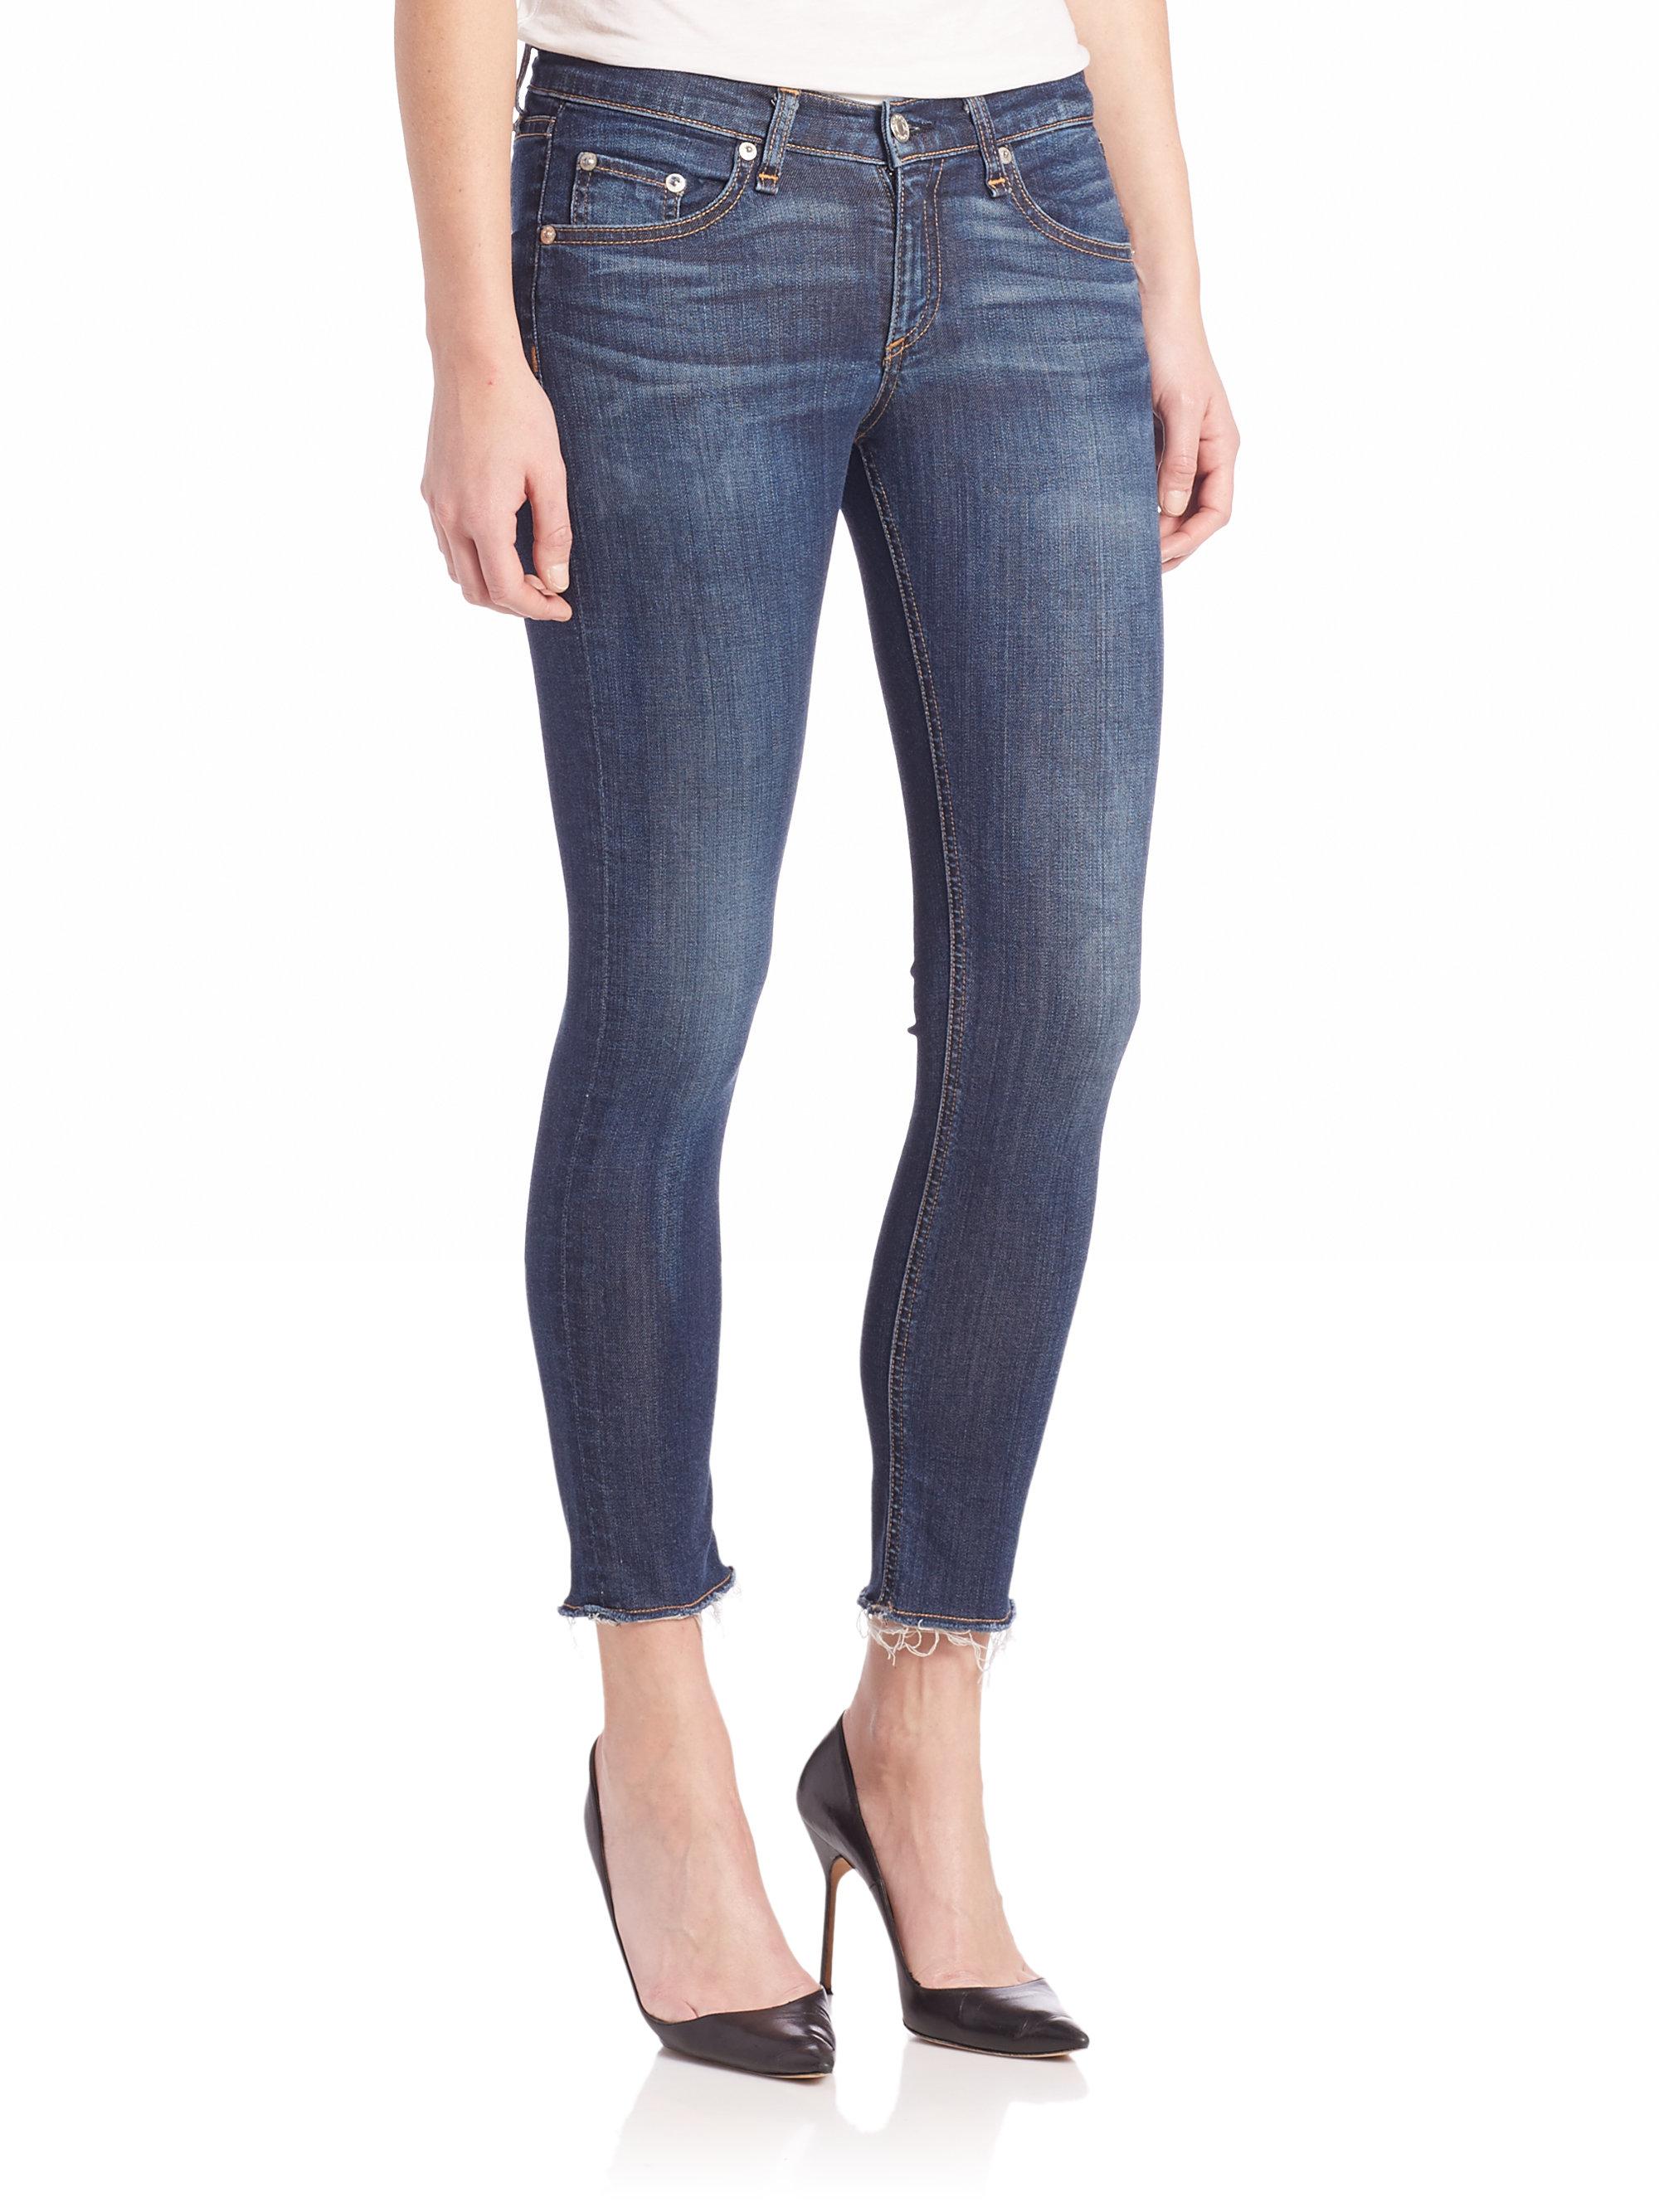 Rag & bone Slim Fit Capri Pants in Blue   Lyst